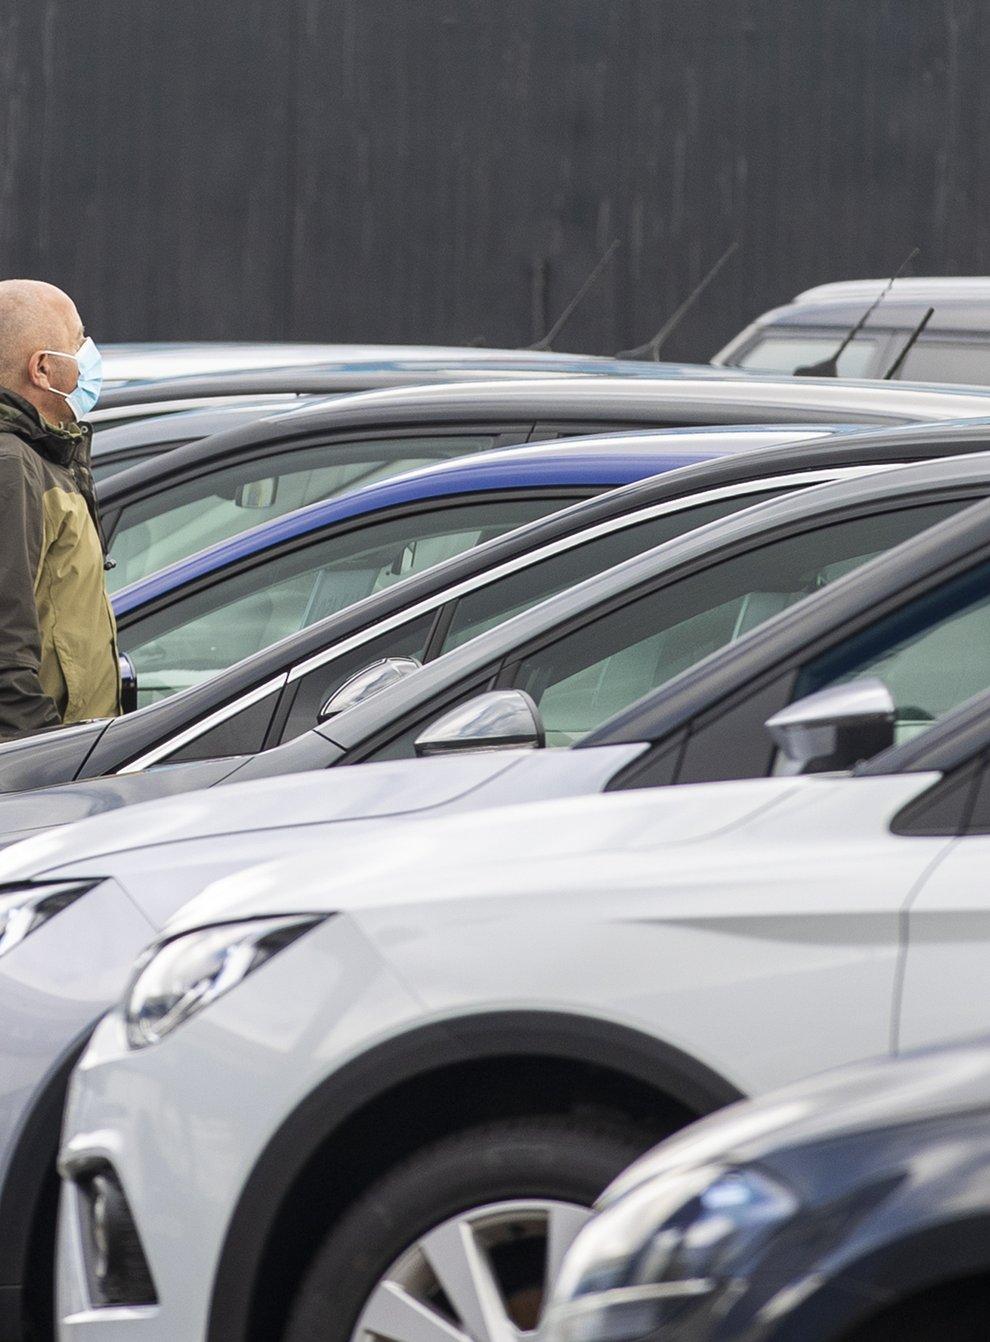 A customer looks at cars